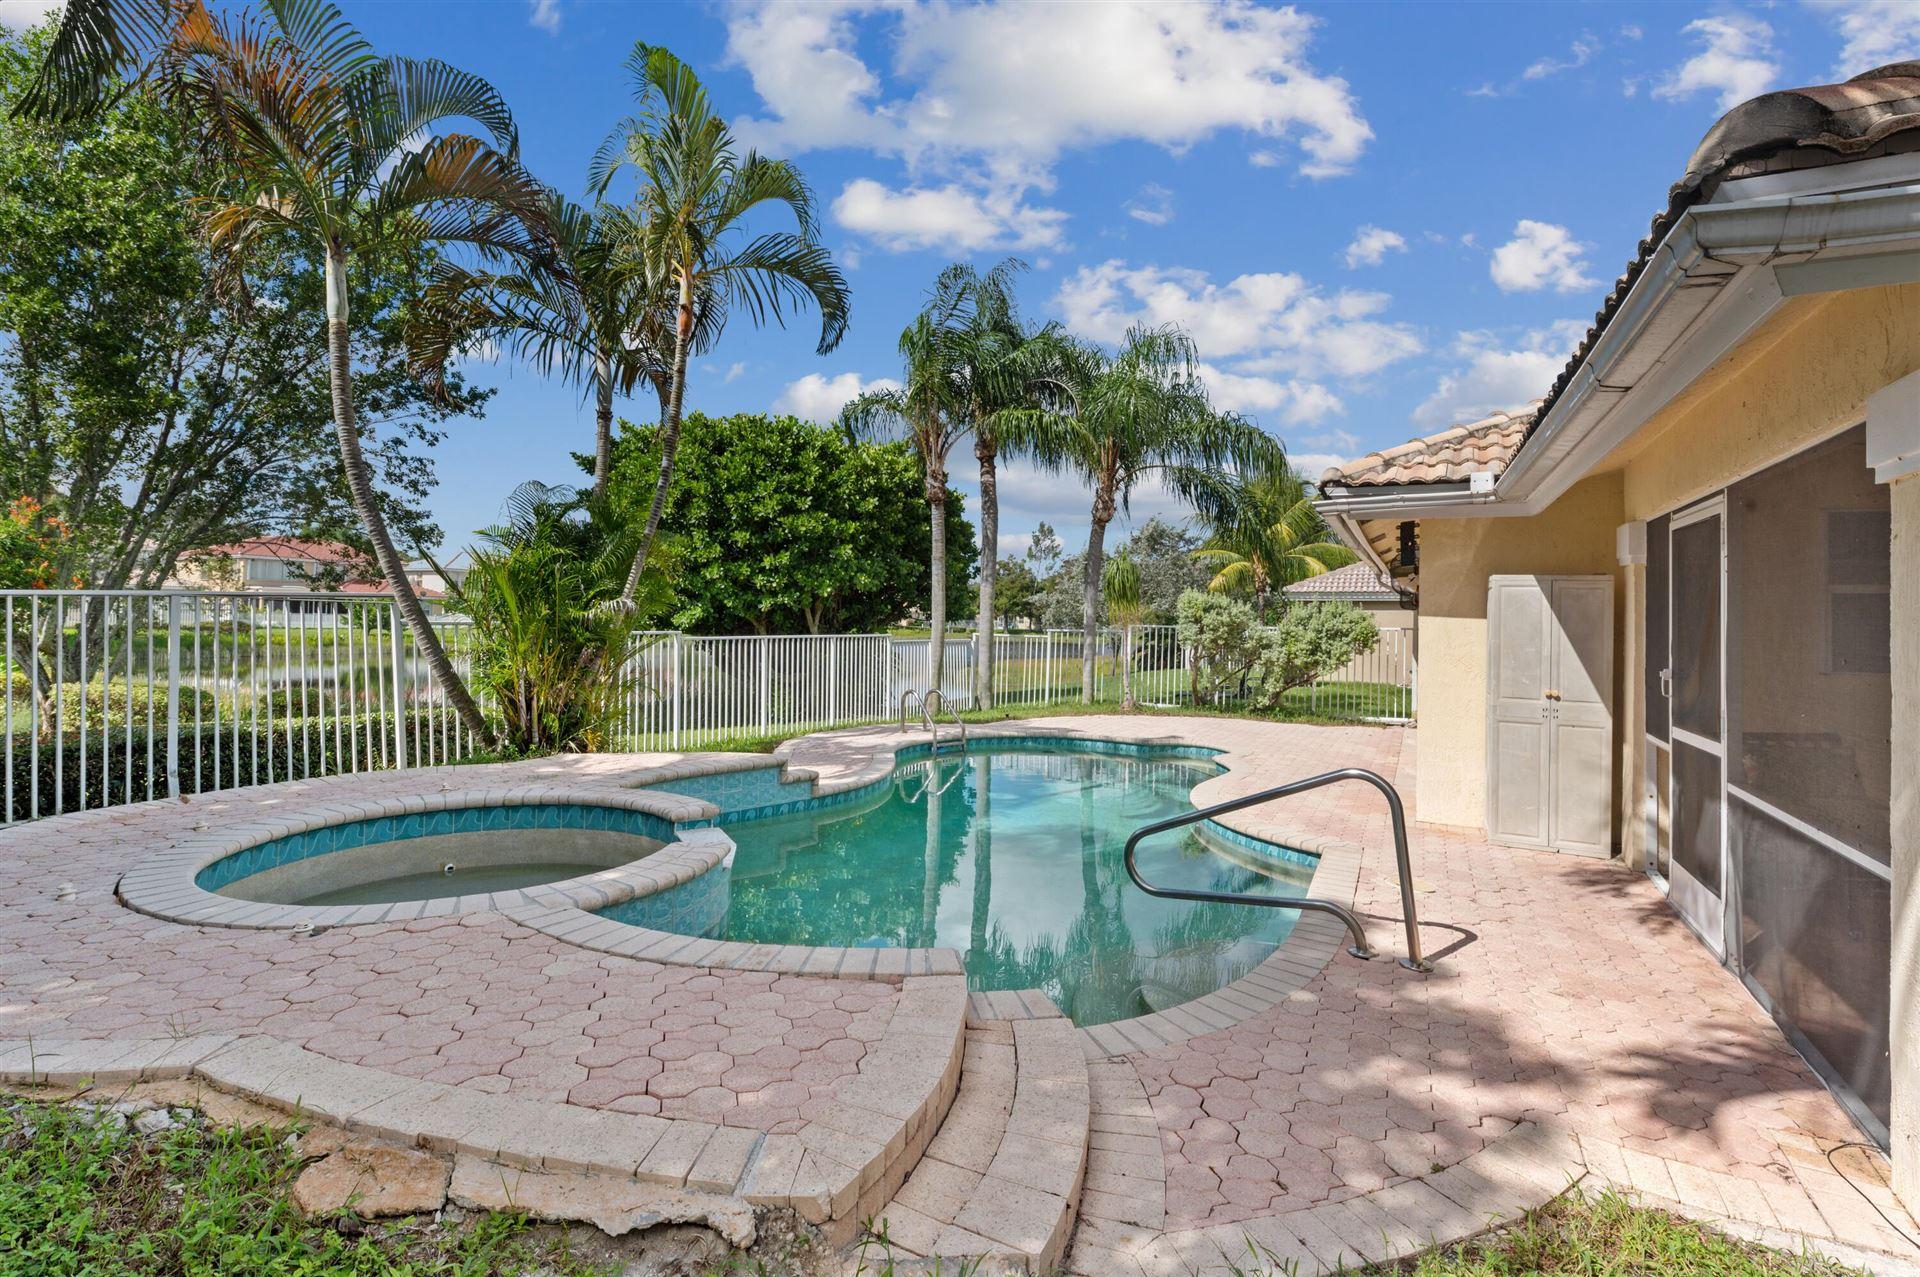 100 Citrus Park Lane, Boynton Beach, FL 33436 - MLS#: RX-10744885